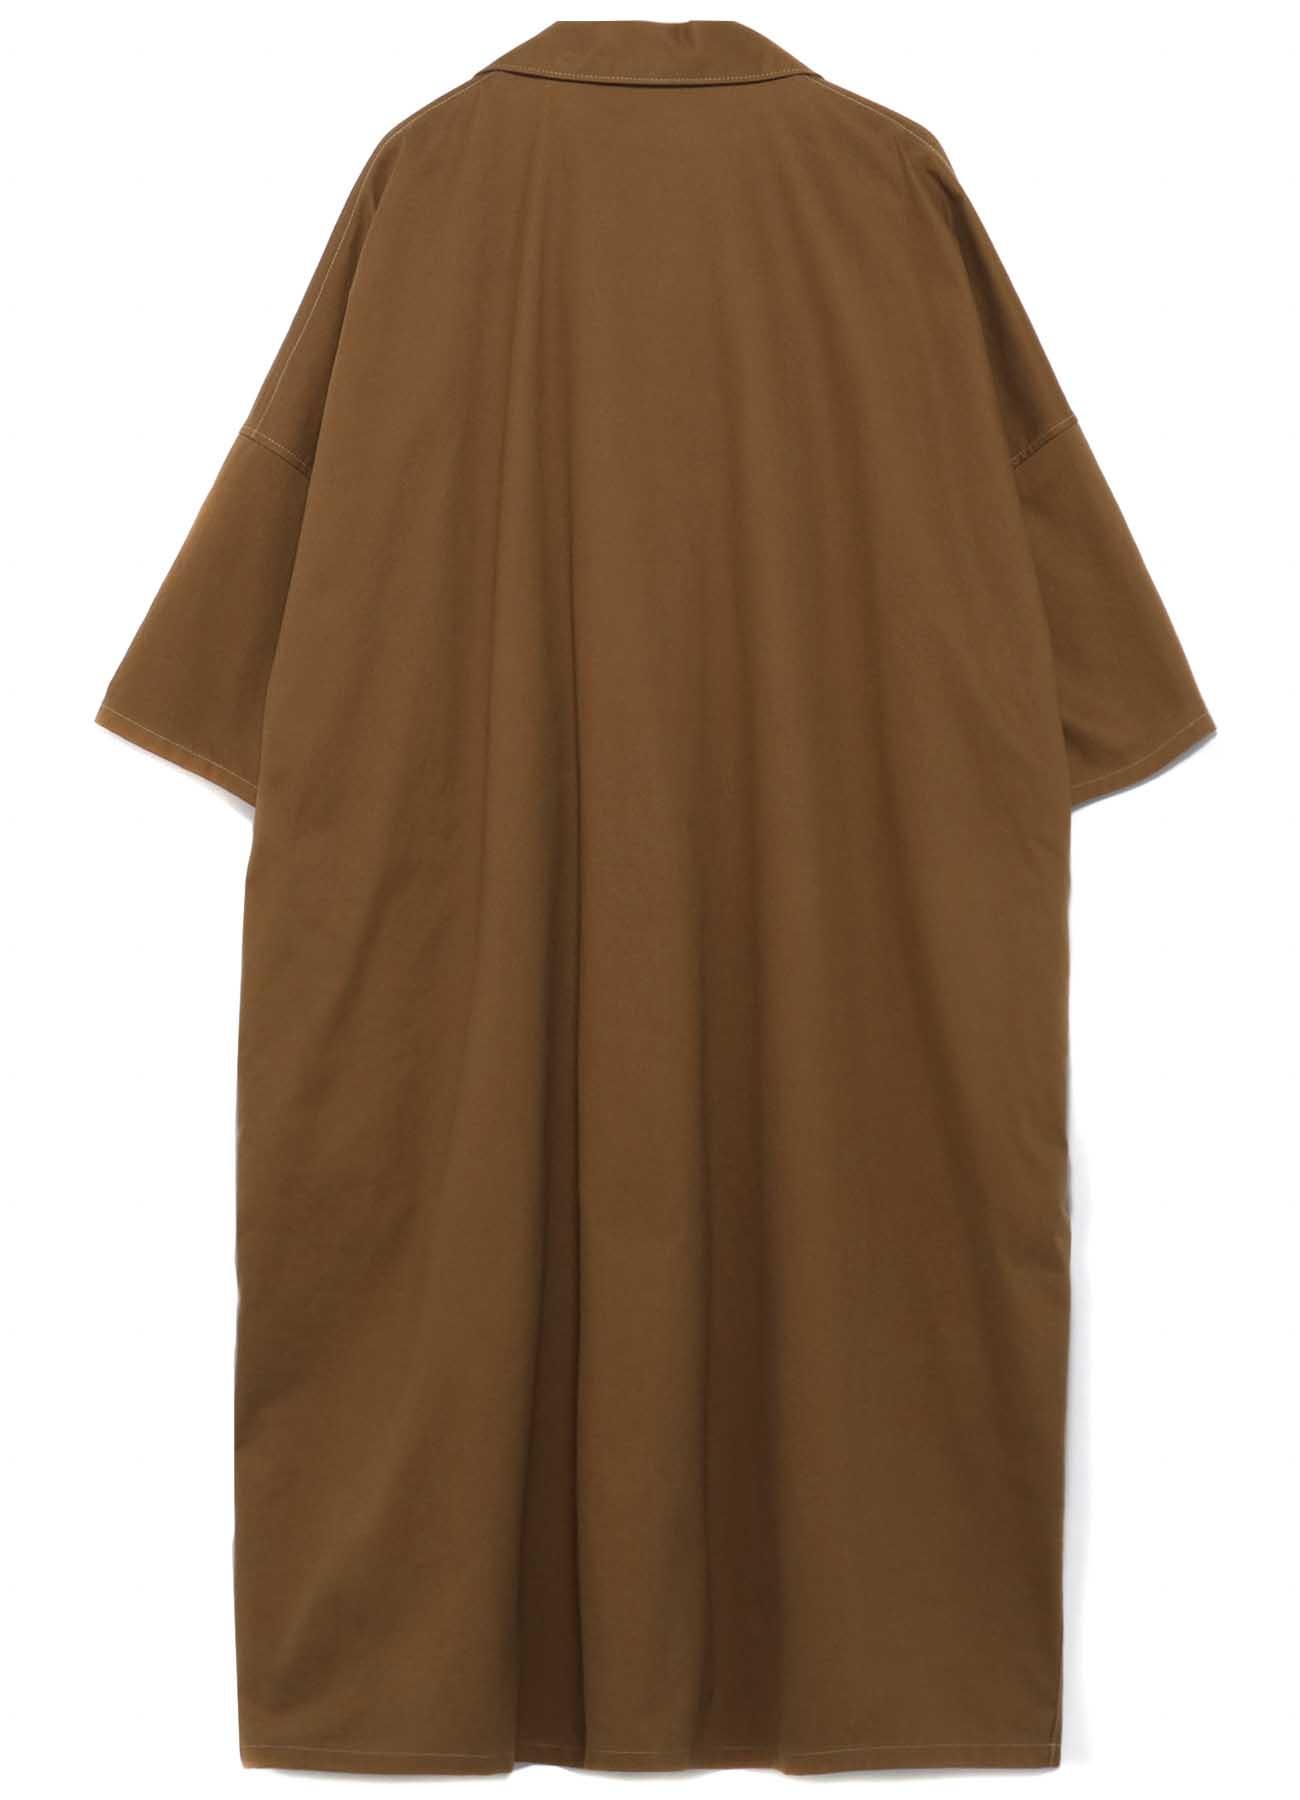 SOFT CHINO CLOTH FRONT DECO CLOTH POCKET SHIRT DRESS